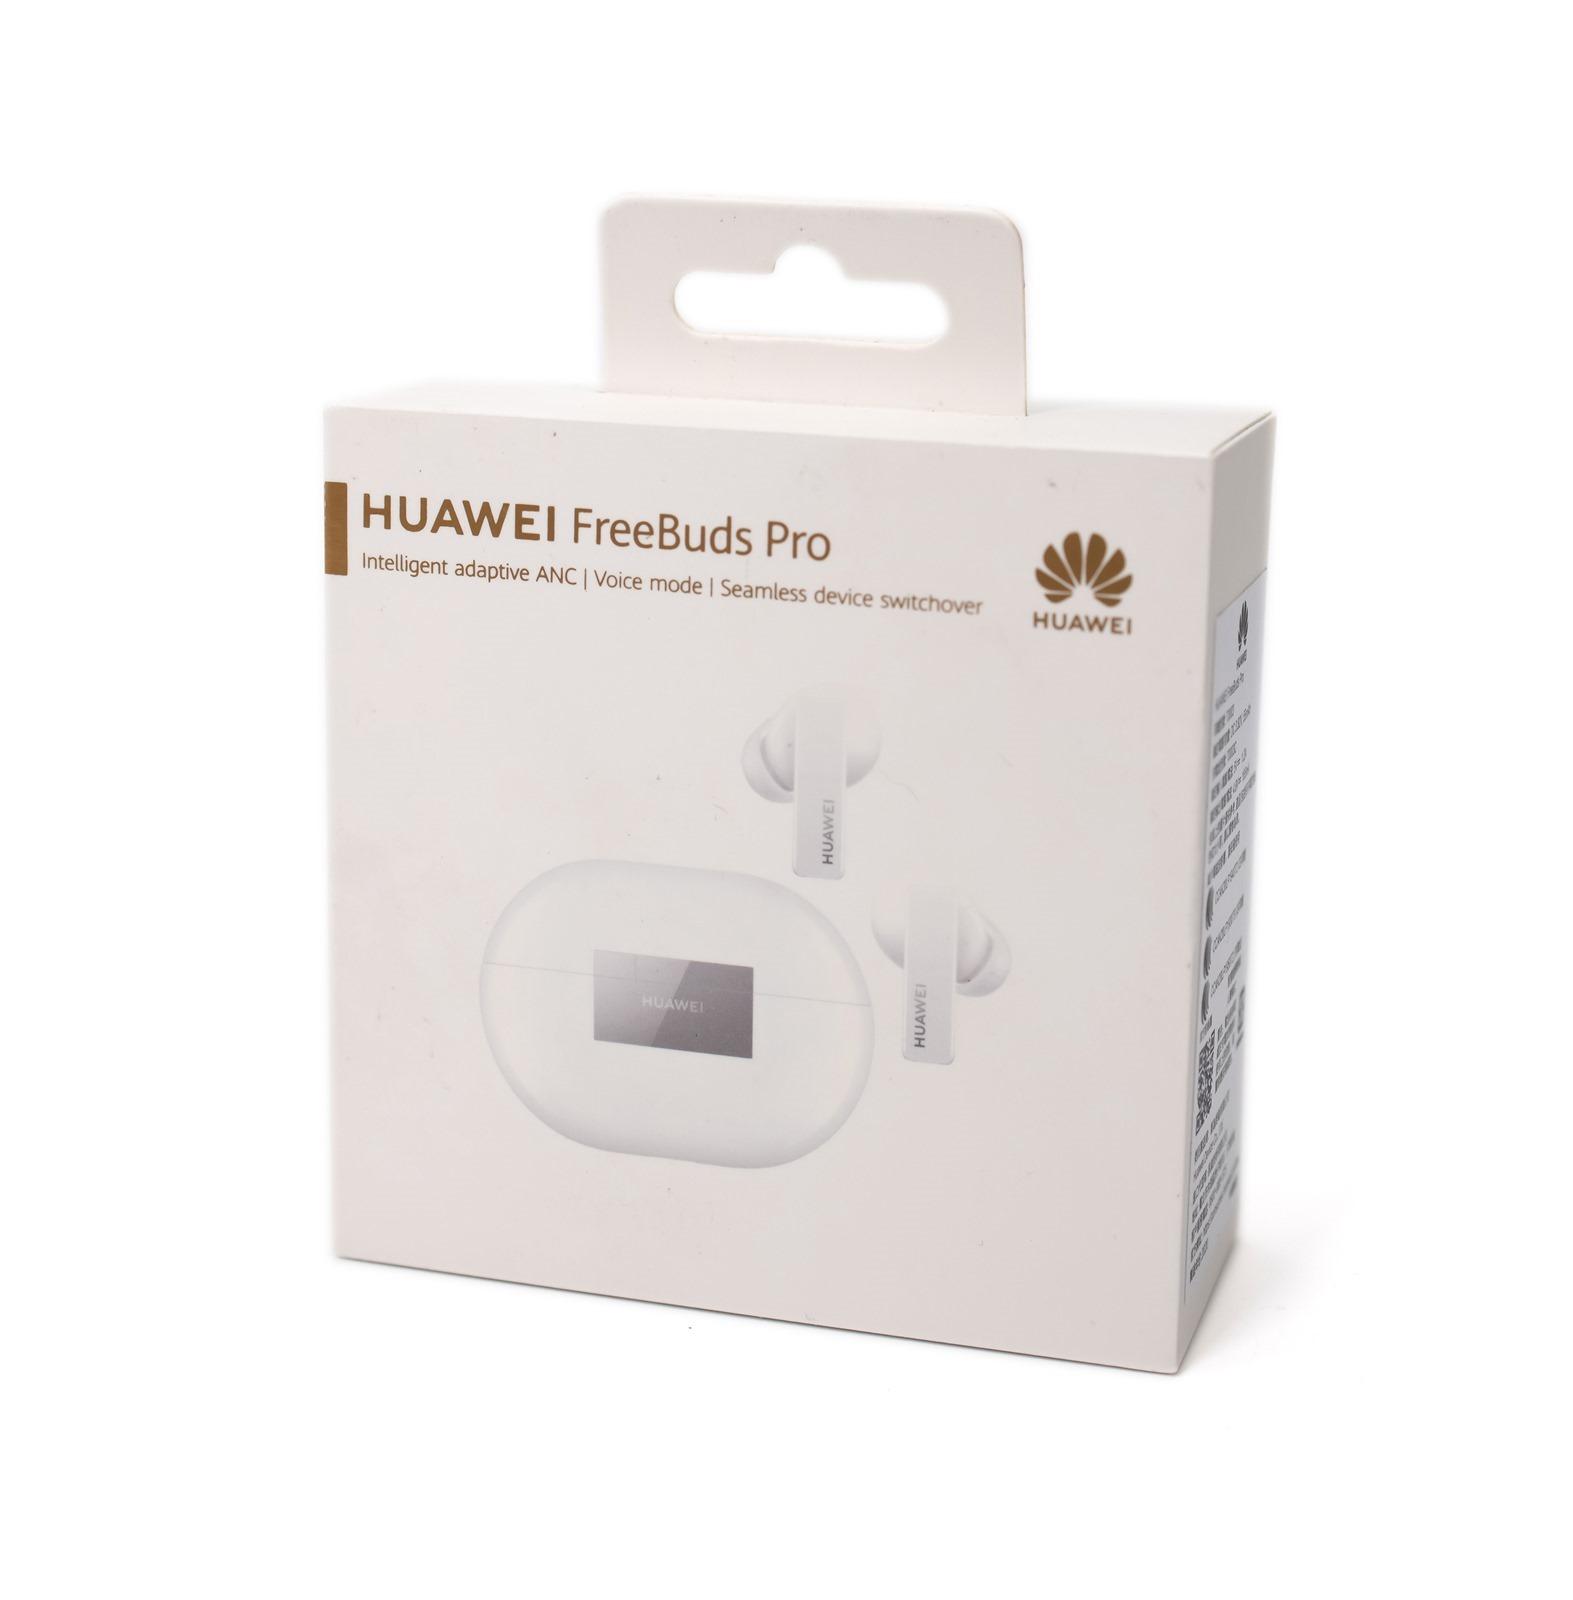 HUAWEI FreeBuds Pro 真無線藍牙耳機,獨家智慧動態降噪、自由選擇聽你想聽的,跨設備連接使用無障礙 @3C 達人廖阿輝